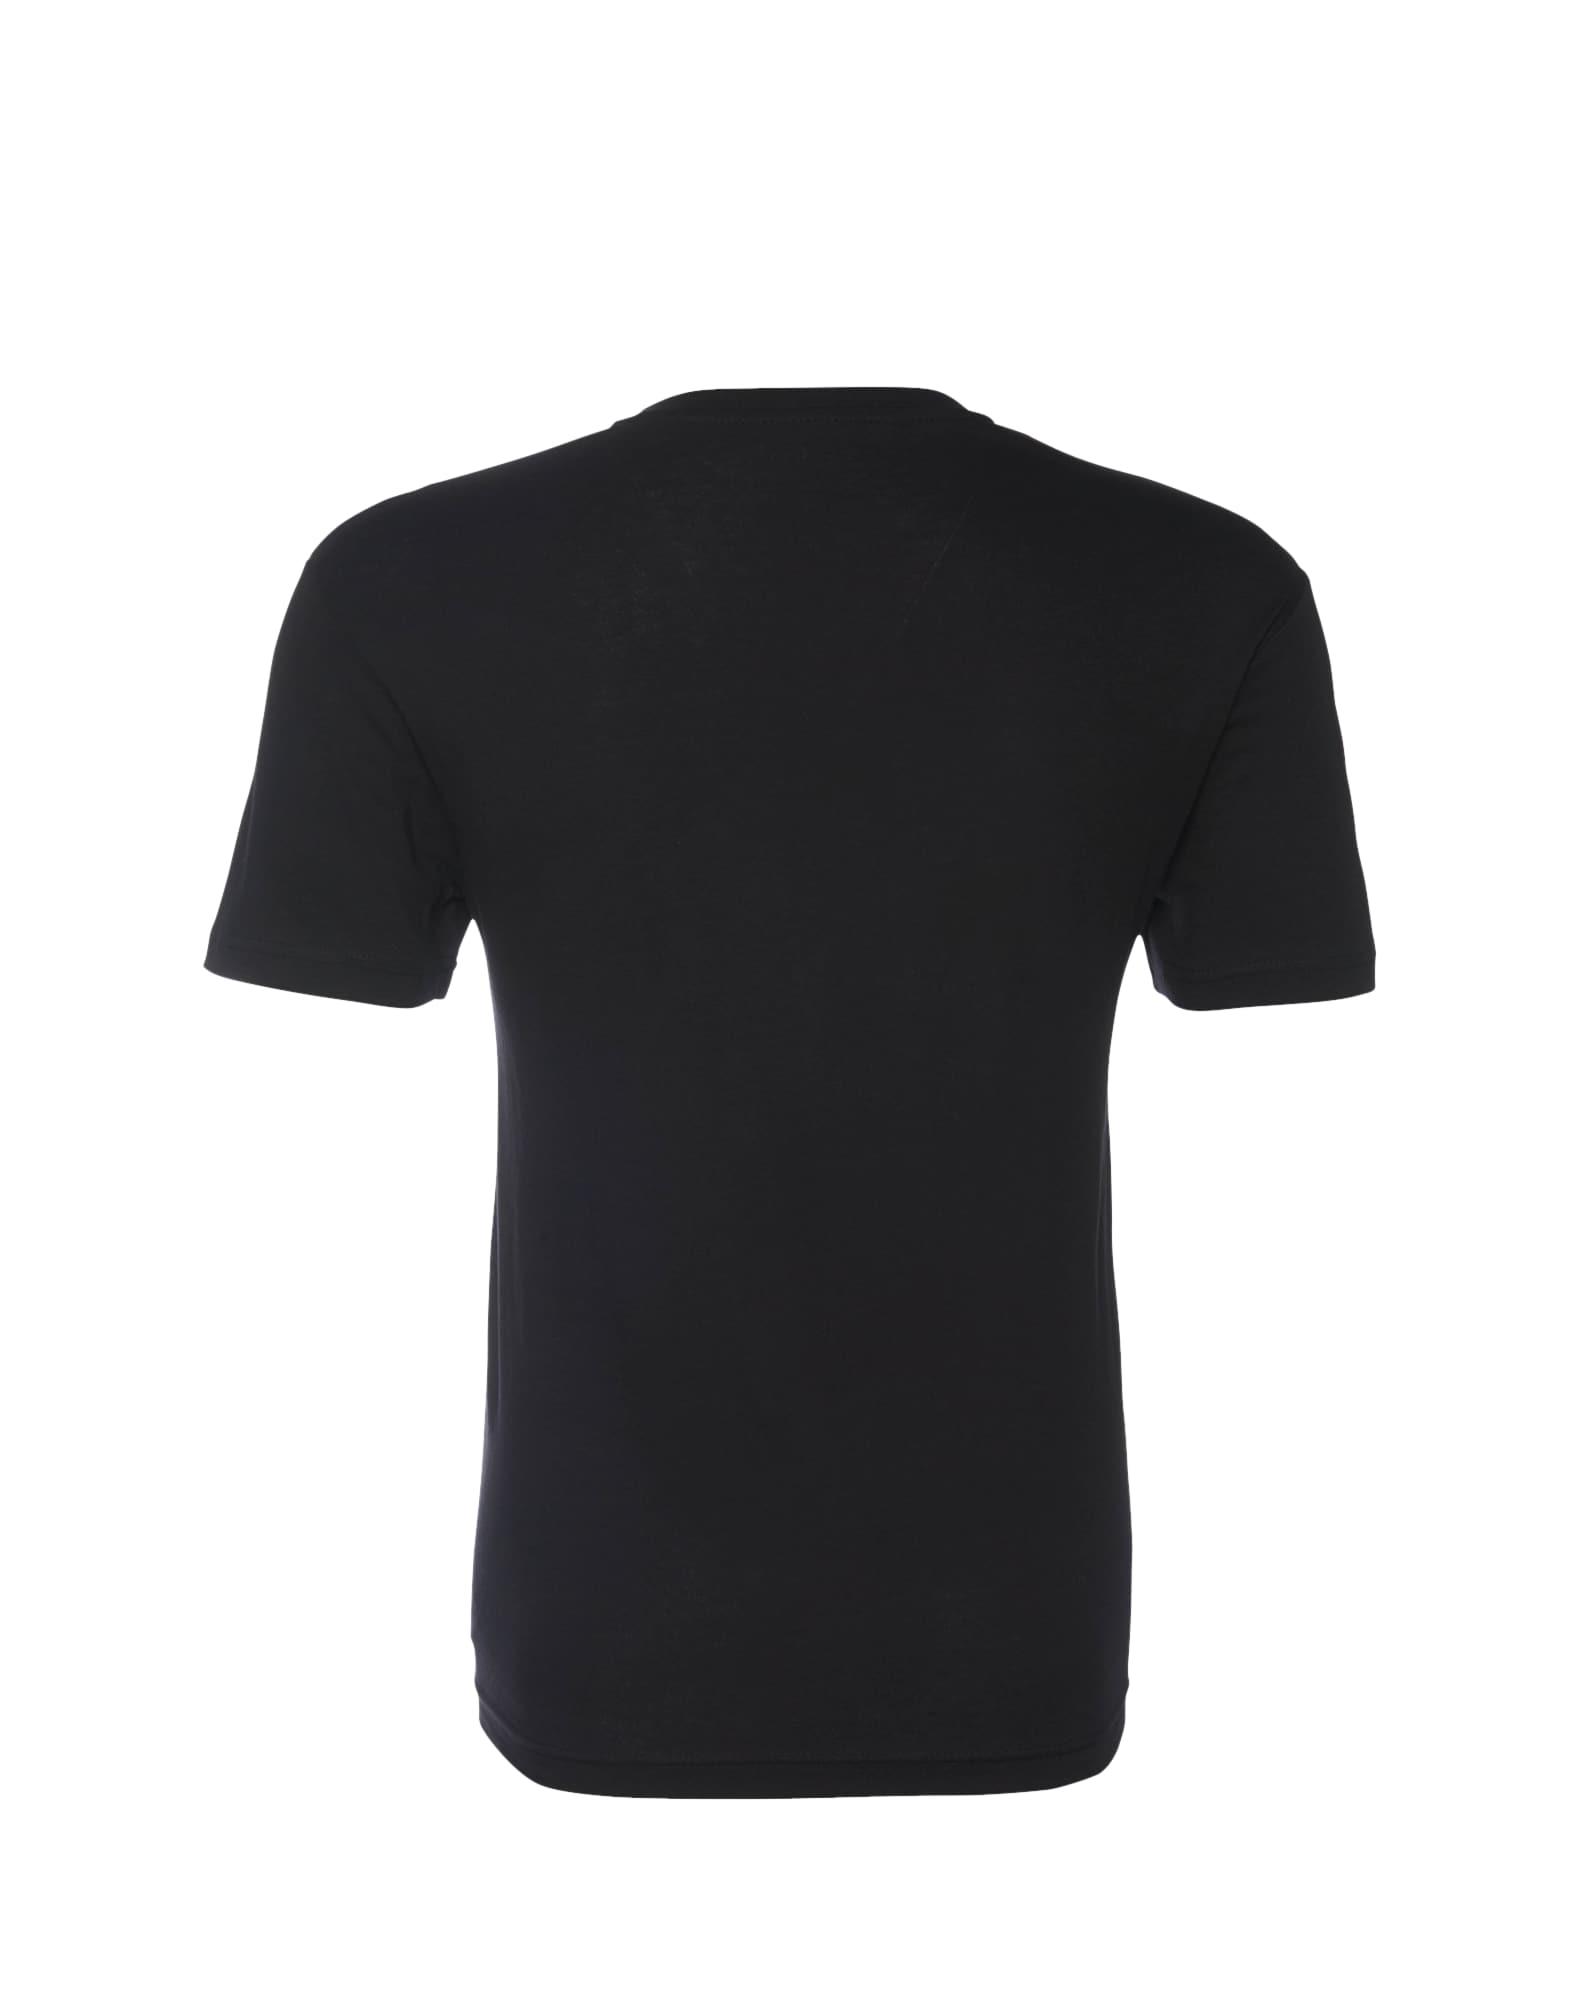 TOM TAILOR, Heren Shirt, zwart